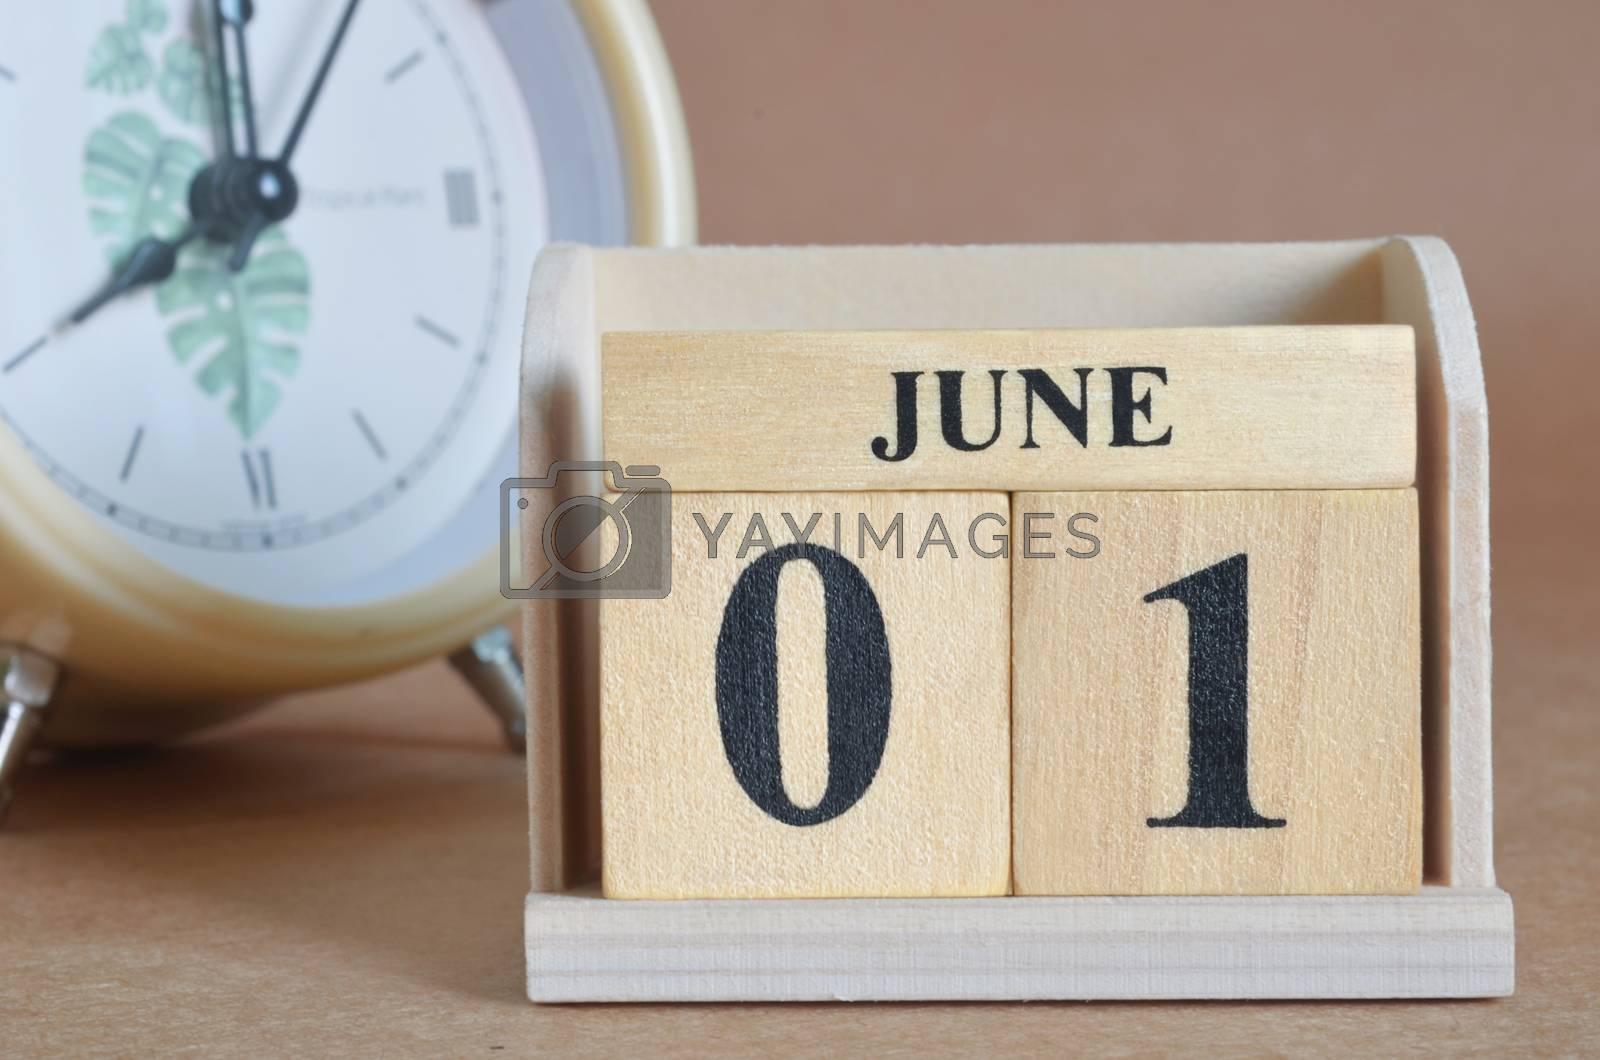 June 1 by Mrfrost